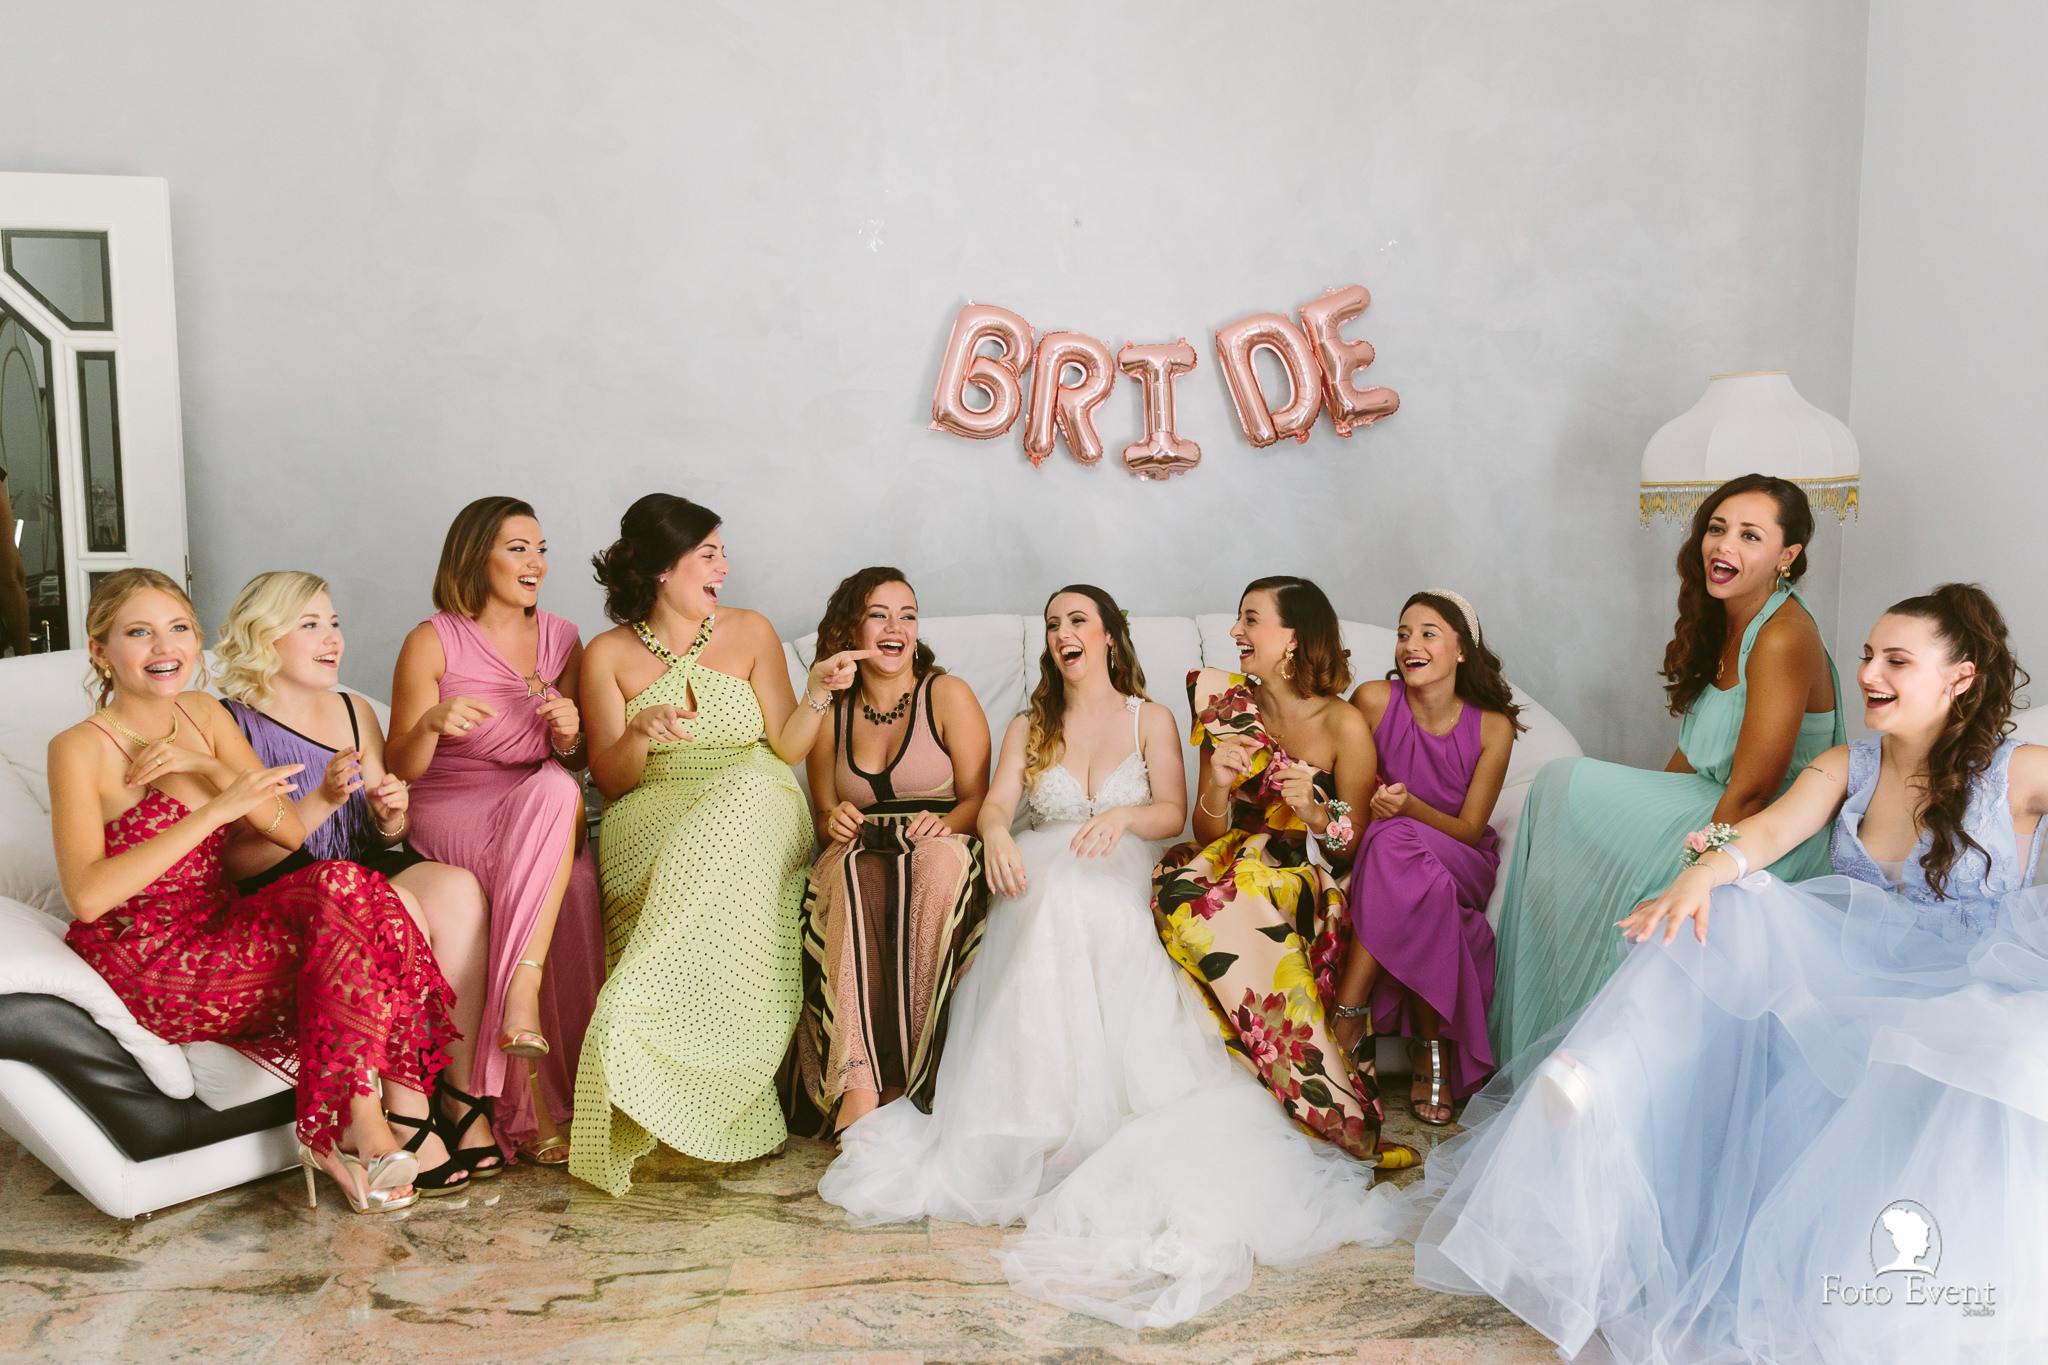 030-2019-08-22-Matrimonio-Angela-e-Nicola-Iaconis-913